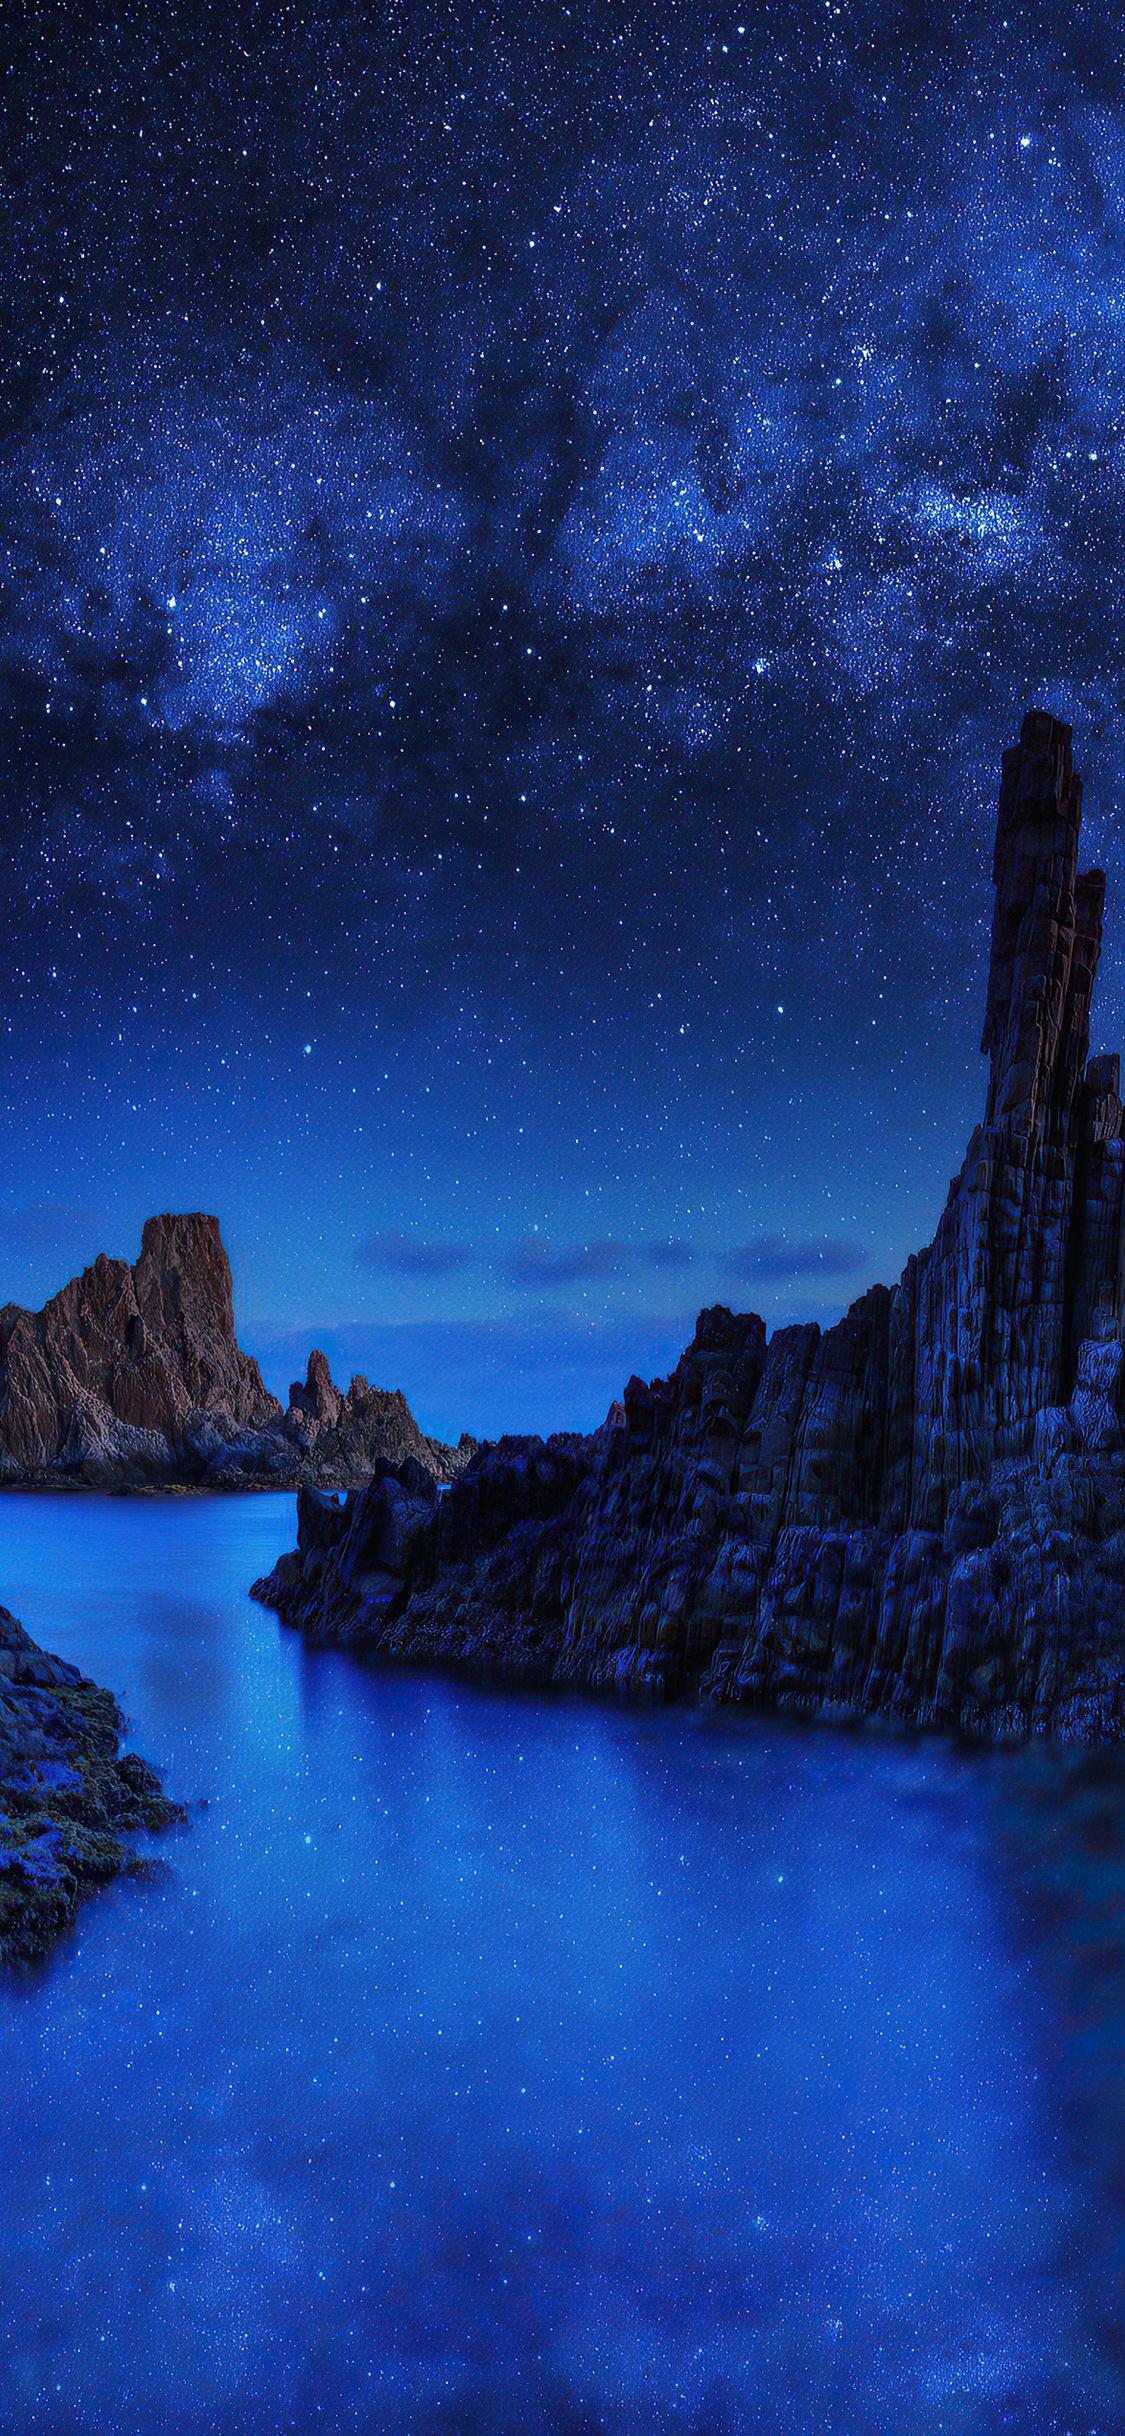 1125x2436 Ocean Rocks On Starry Night 4k Iphone XS,Iphone ...